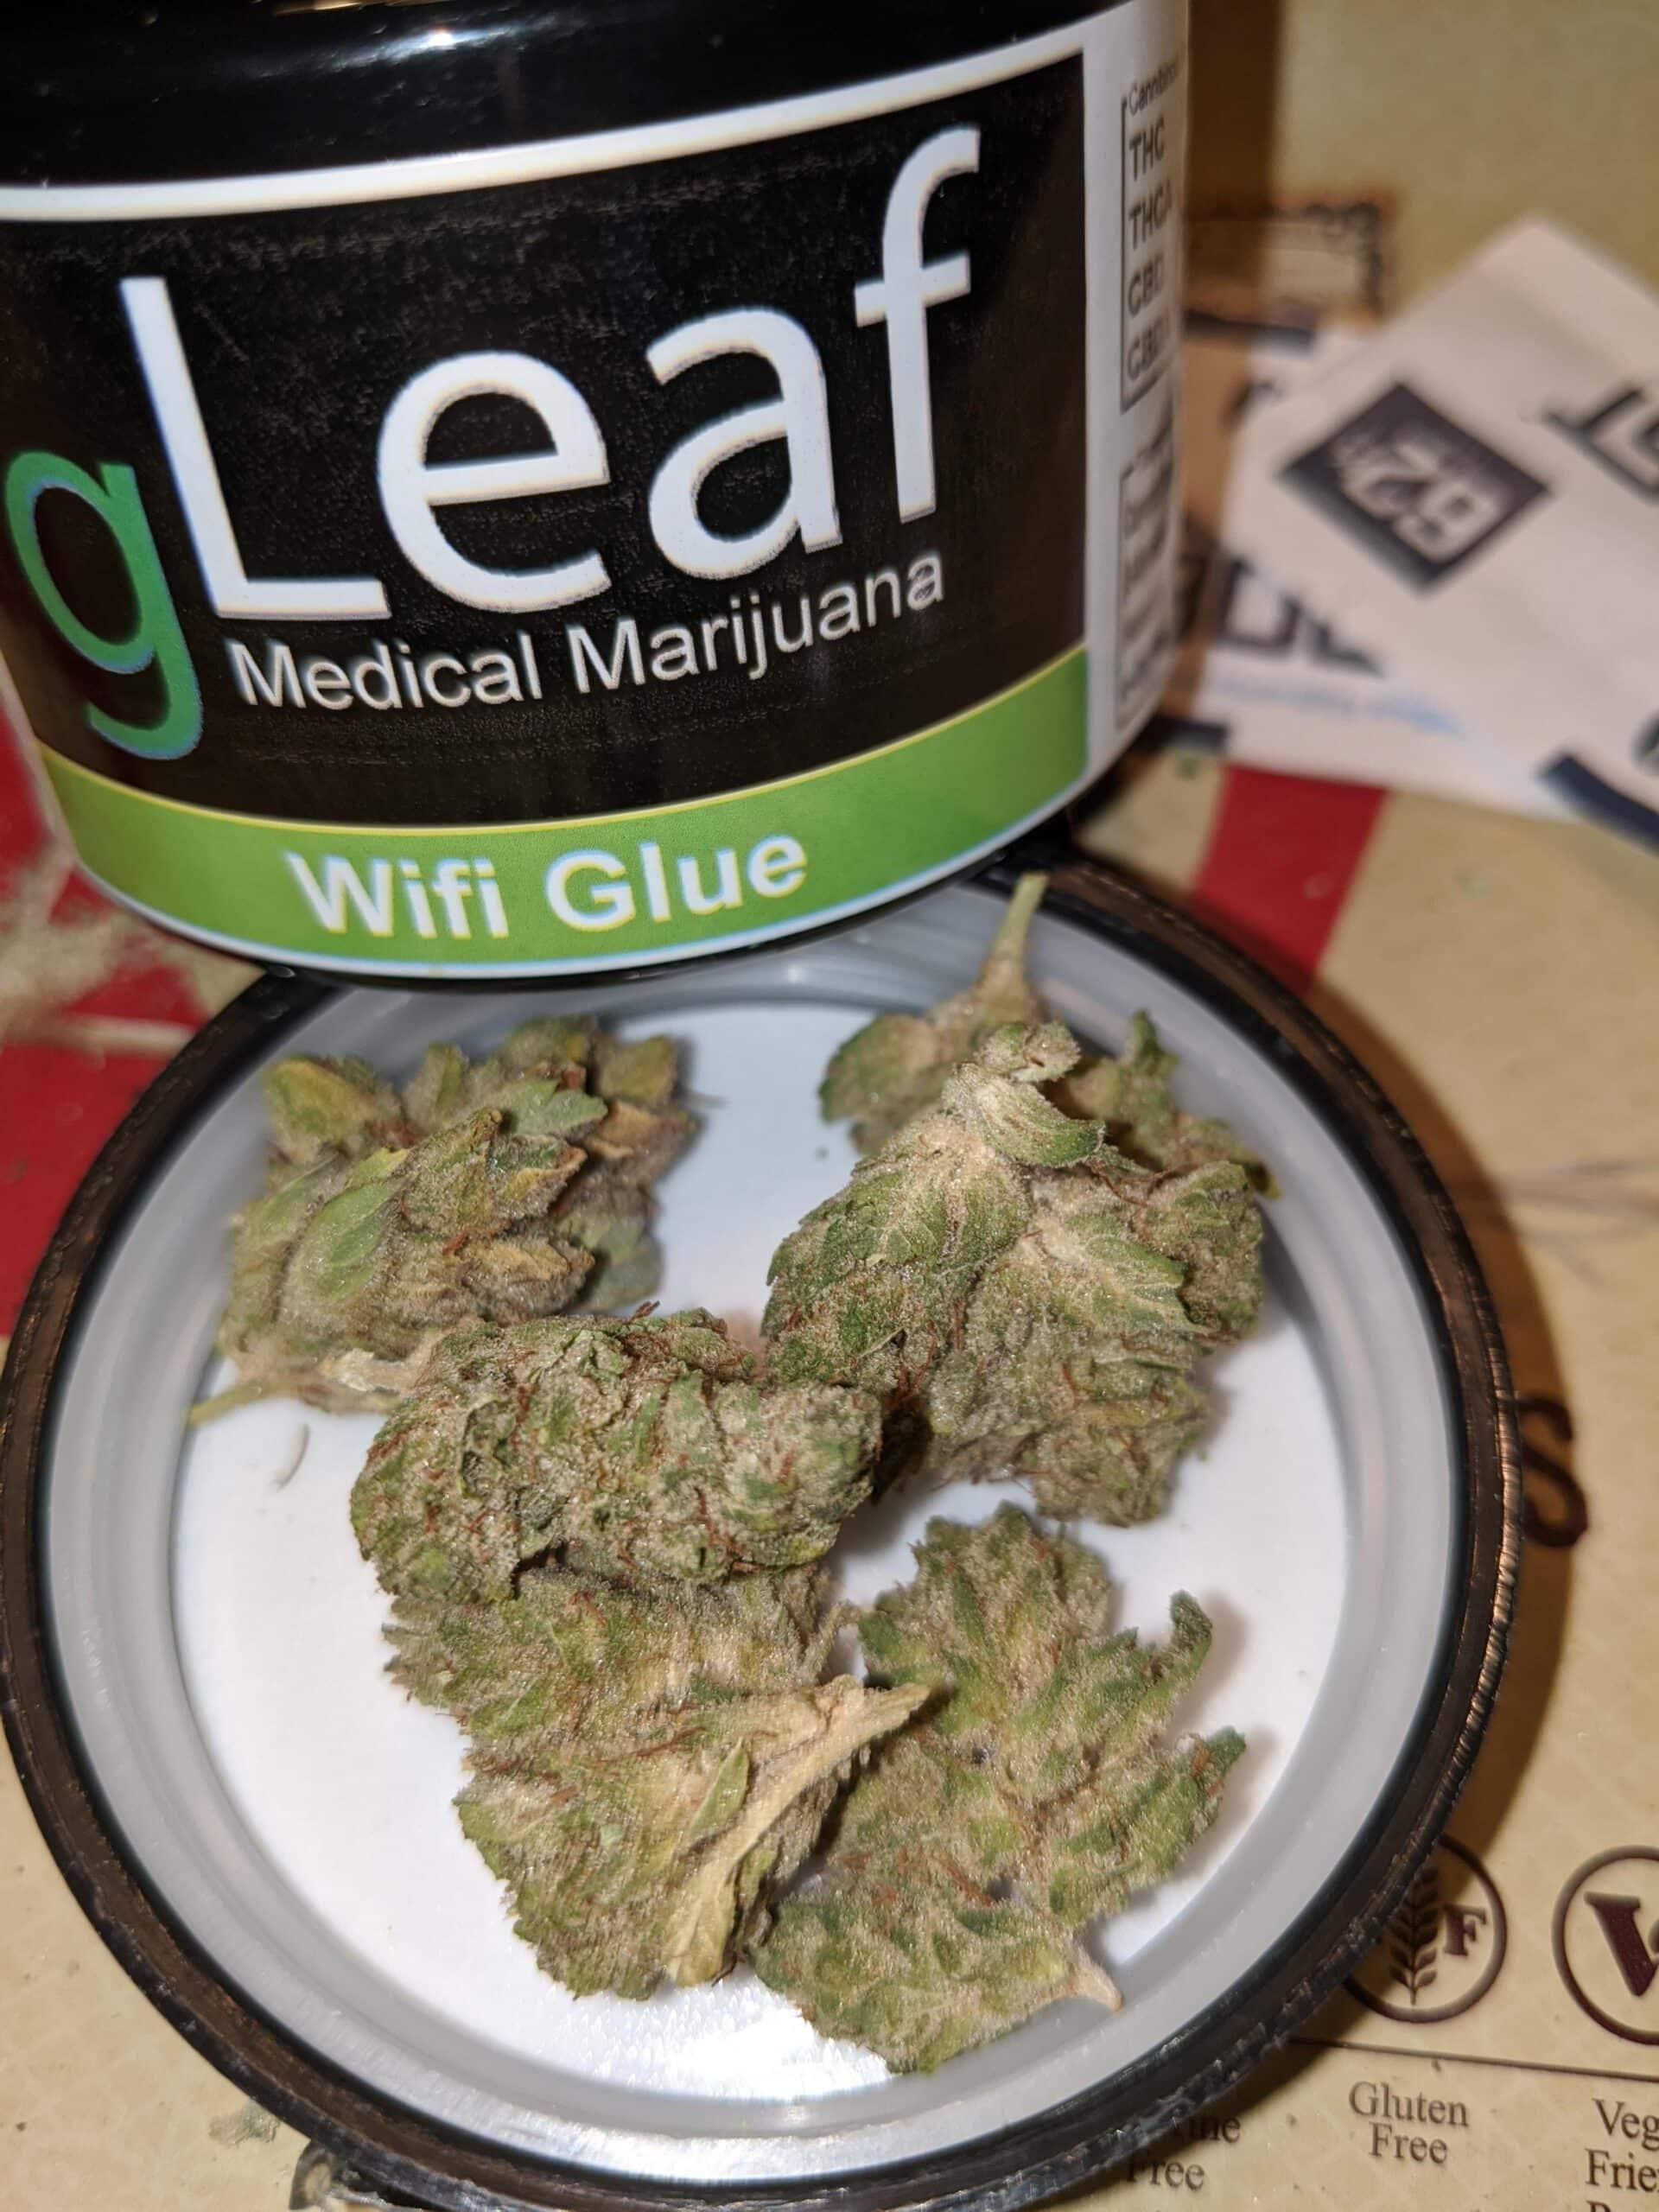 Buy Wifi Glue strain